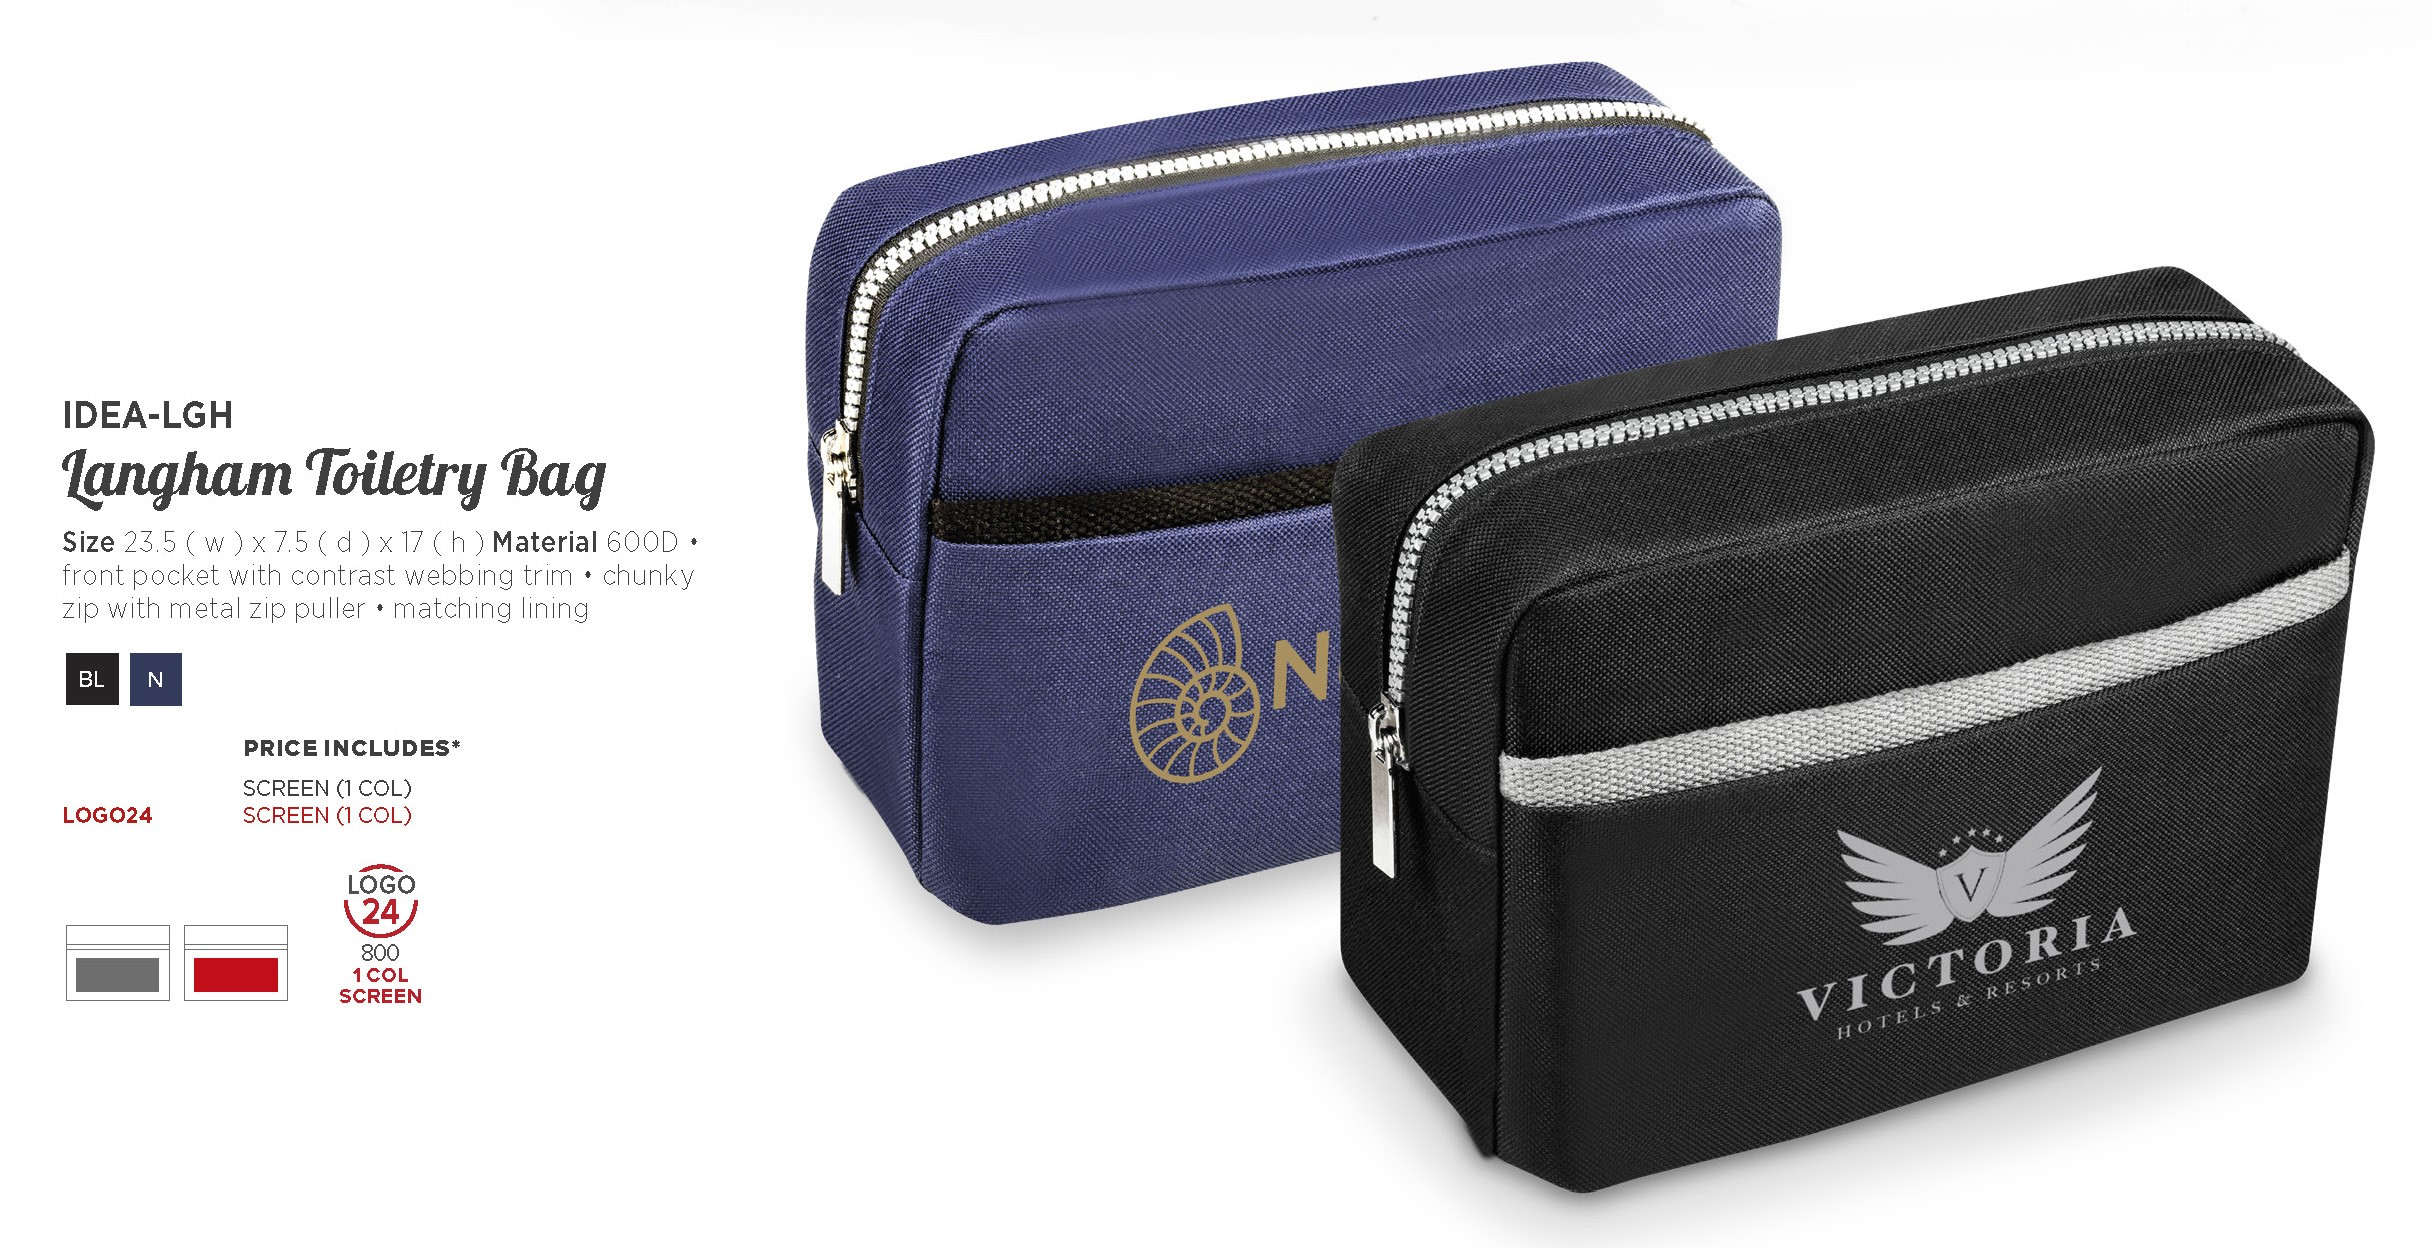 Product: Langham Toiletry Bag